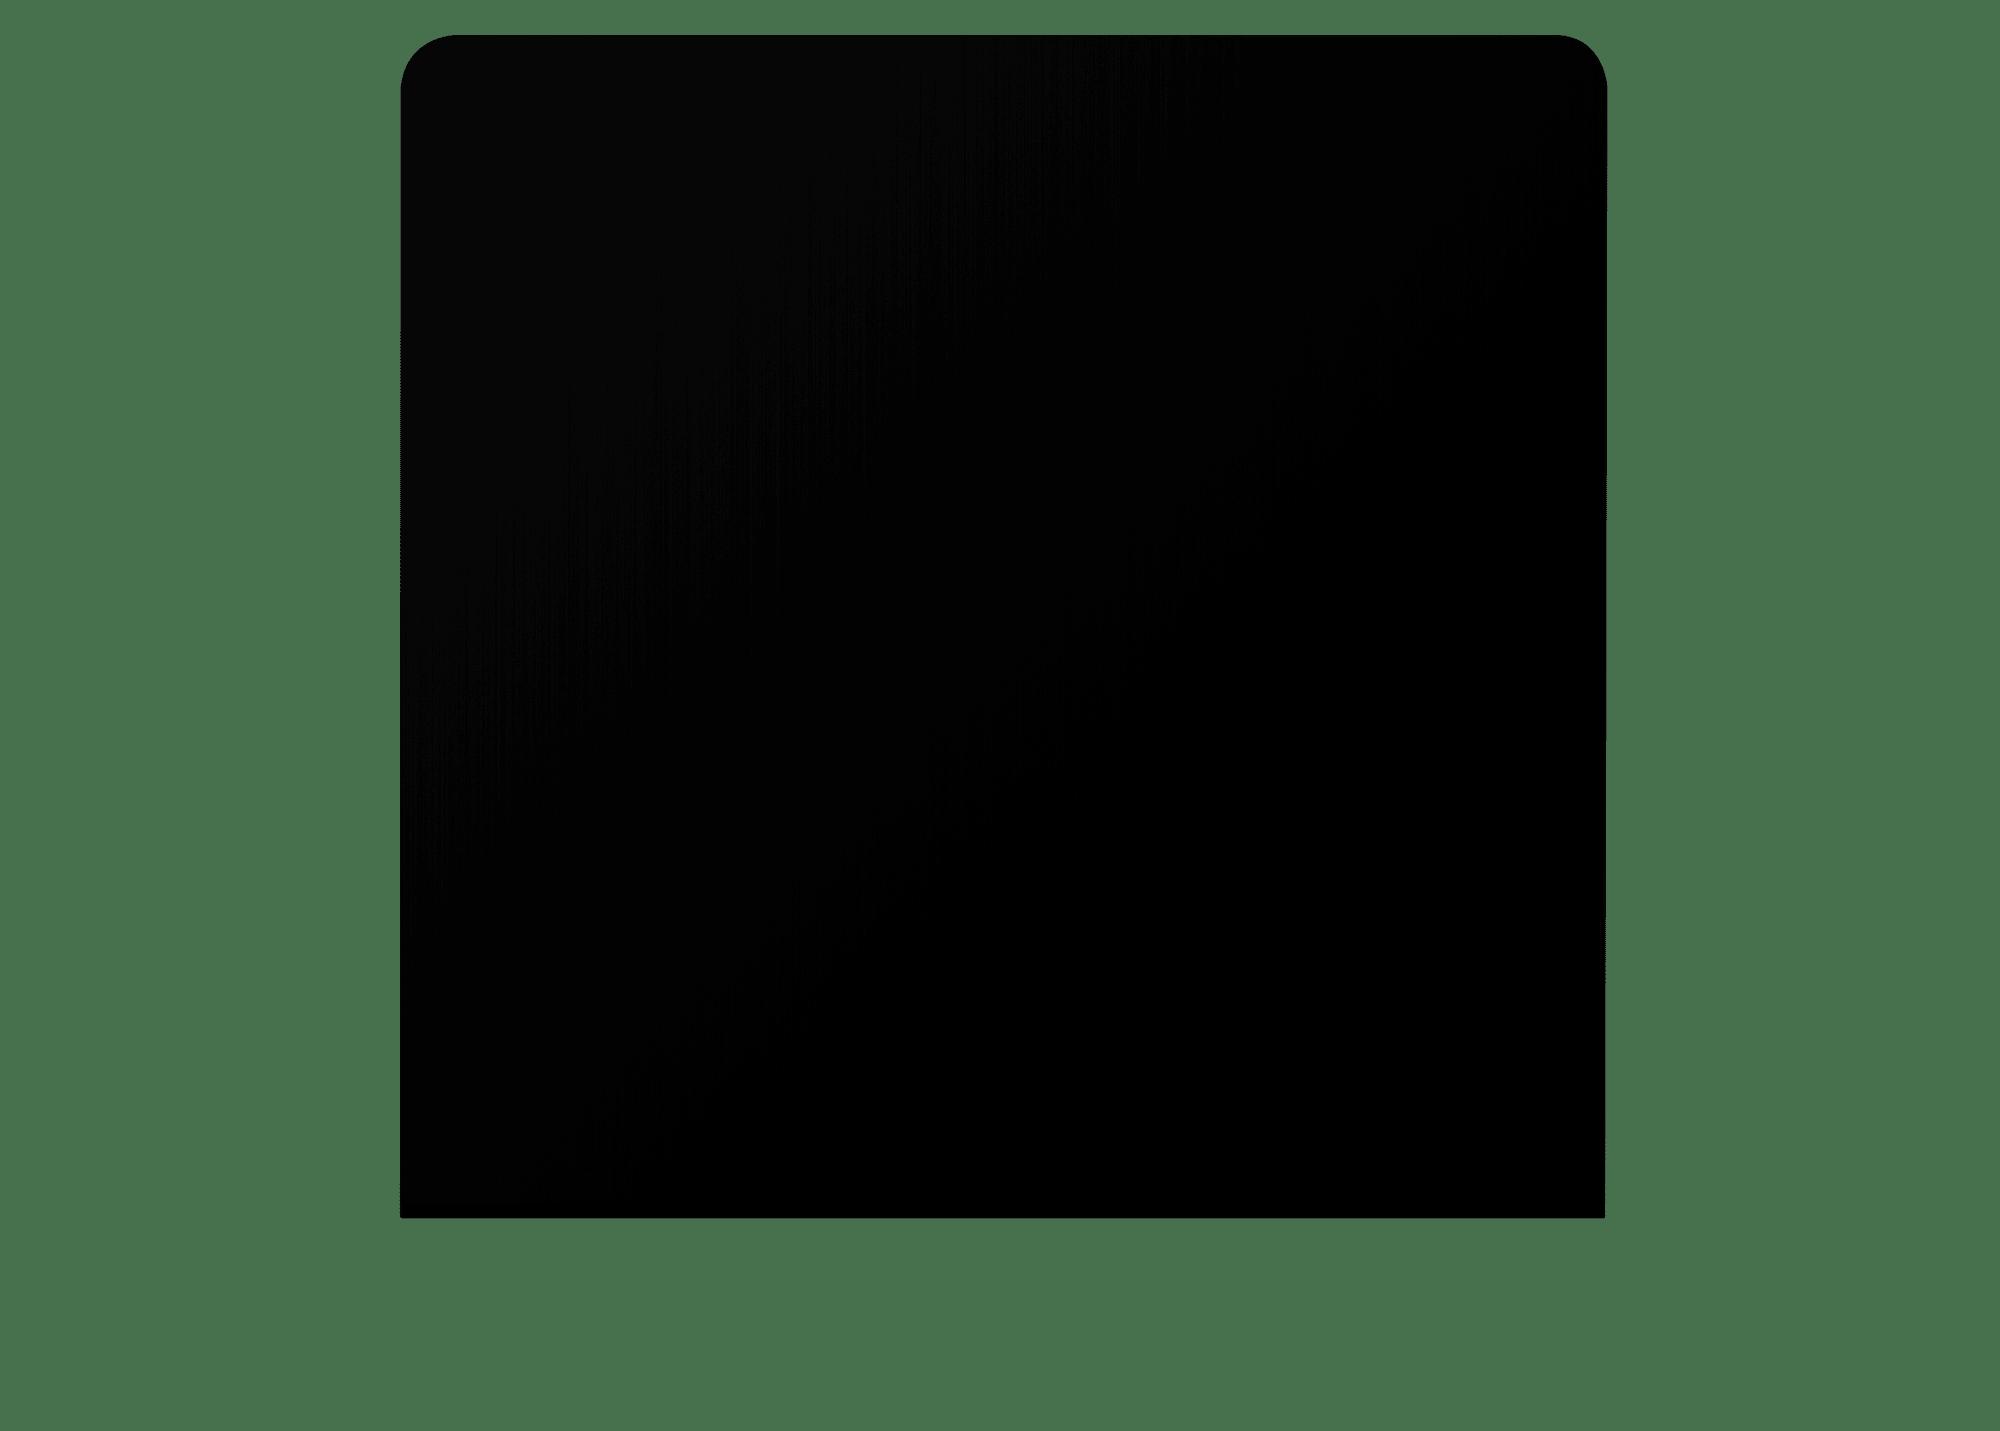 iClon Z4 Pro